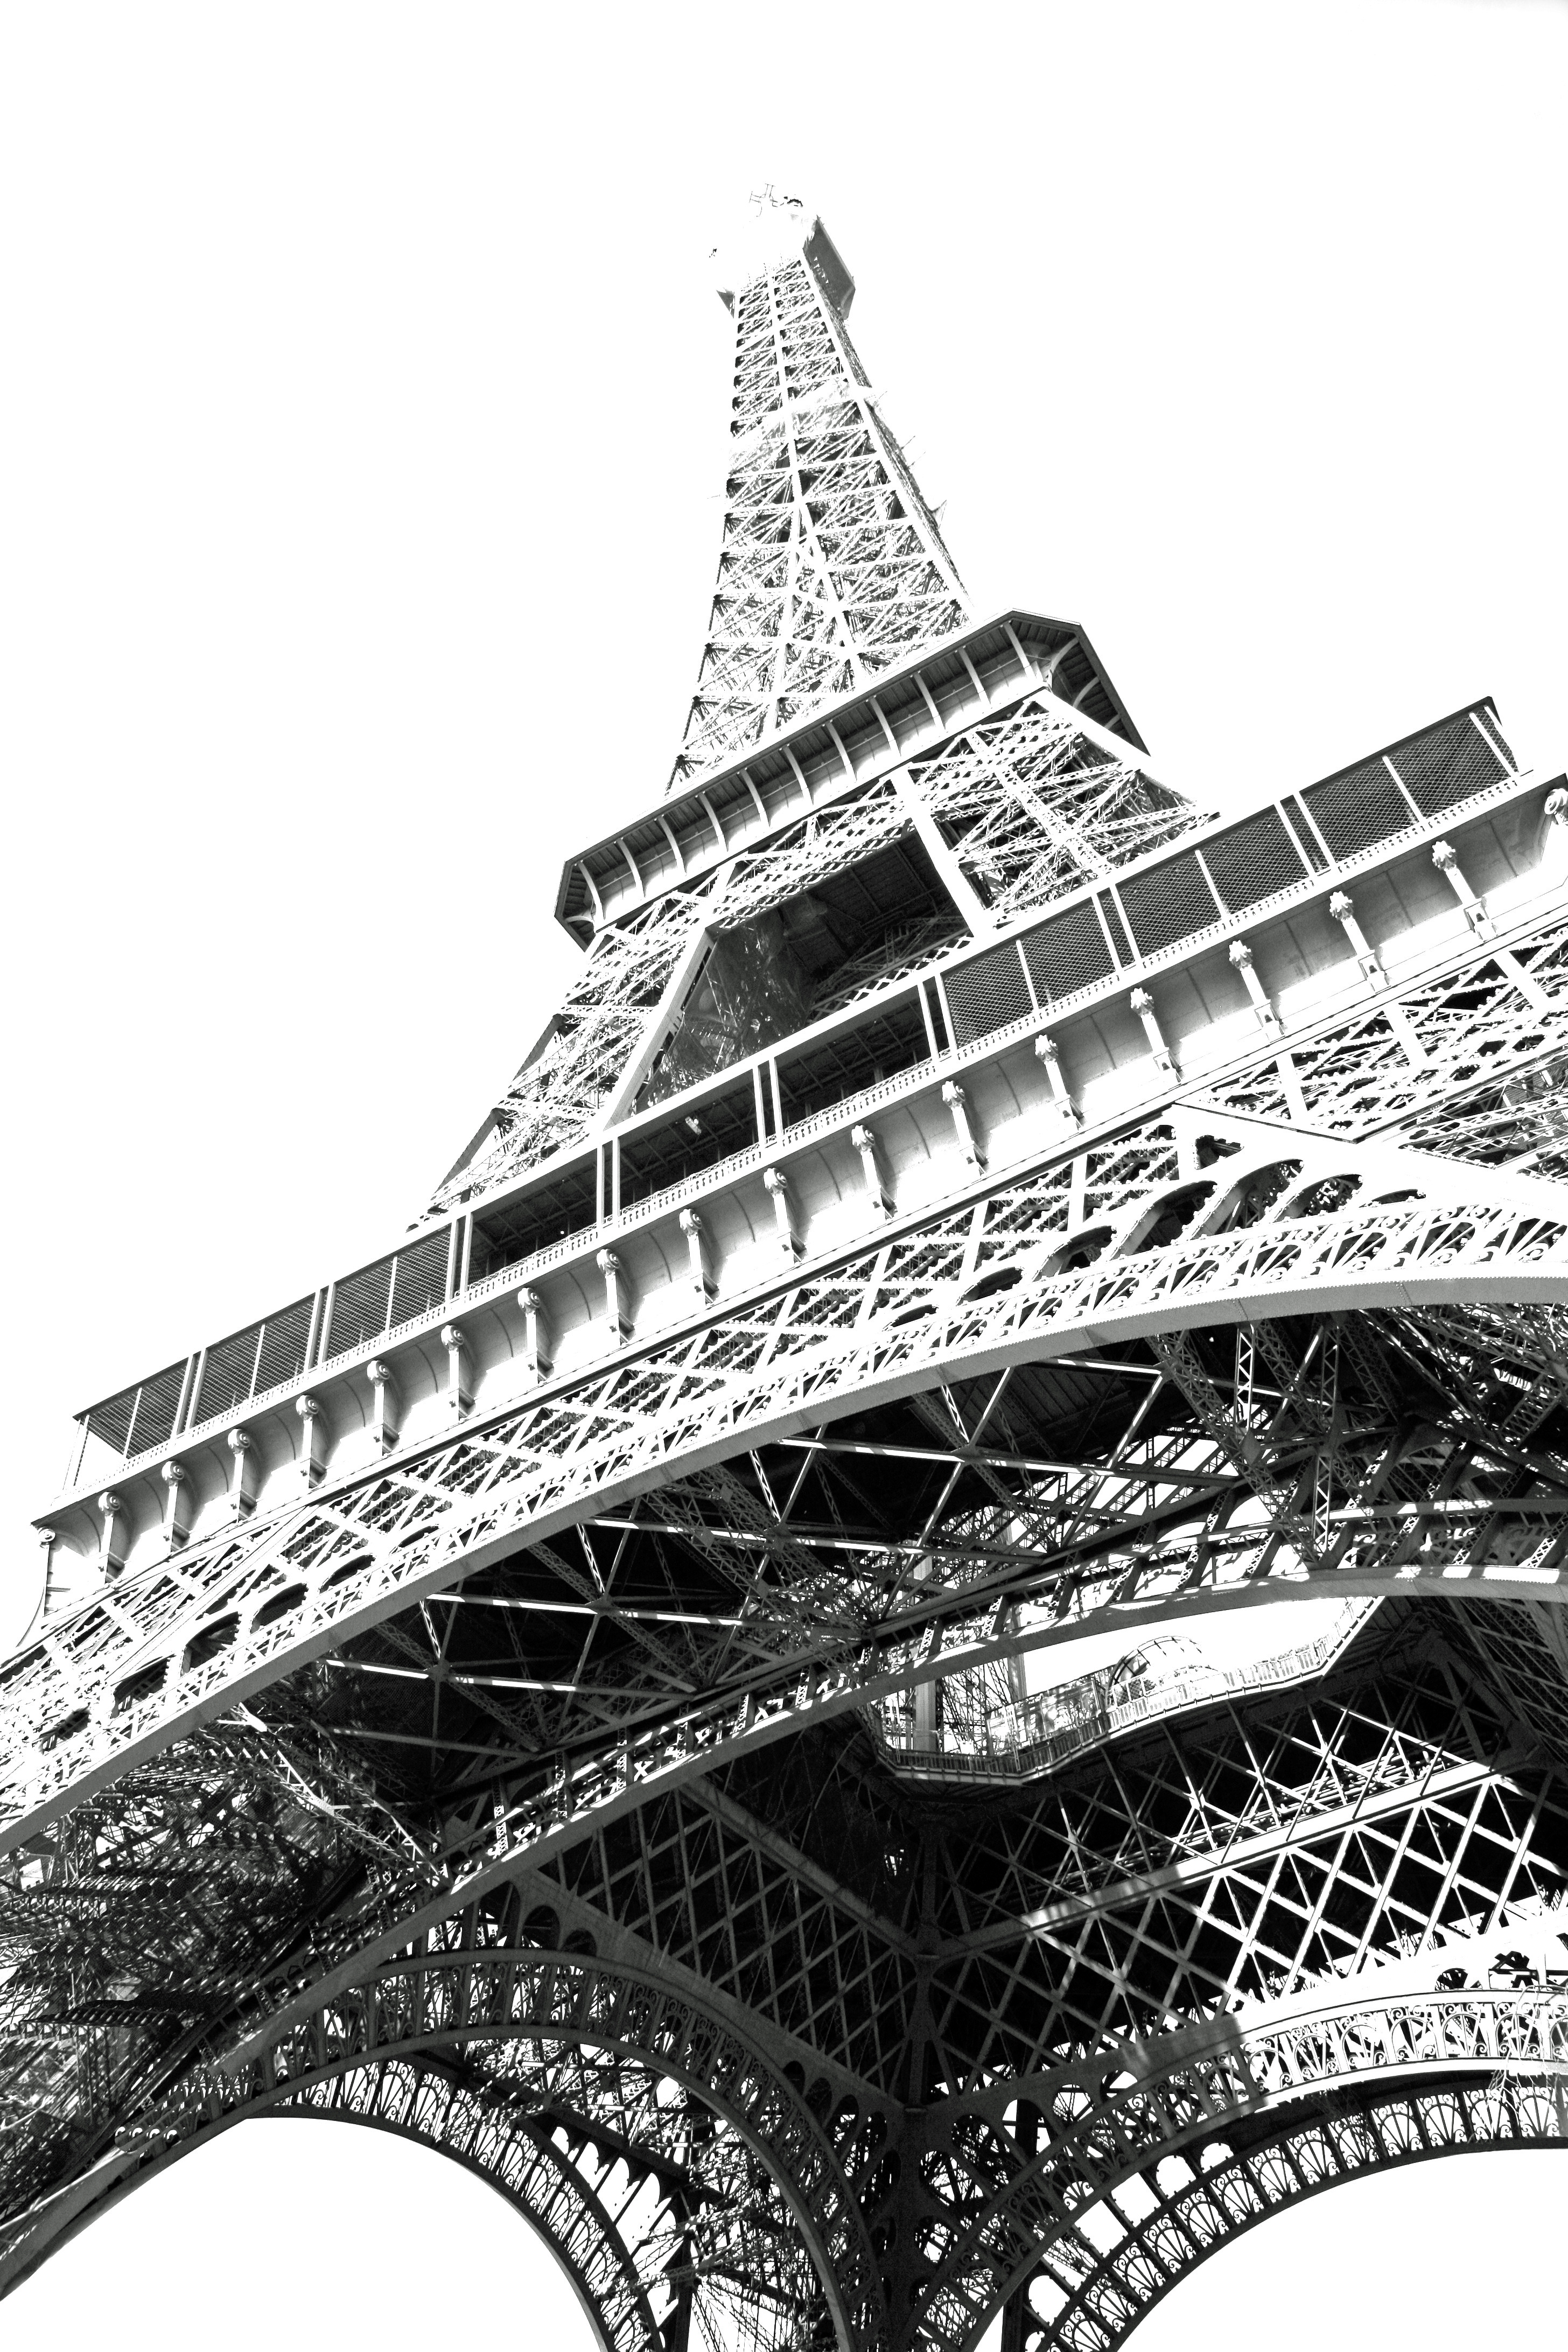 Dessin Illustration Tour Eiffel